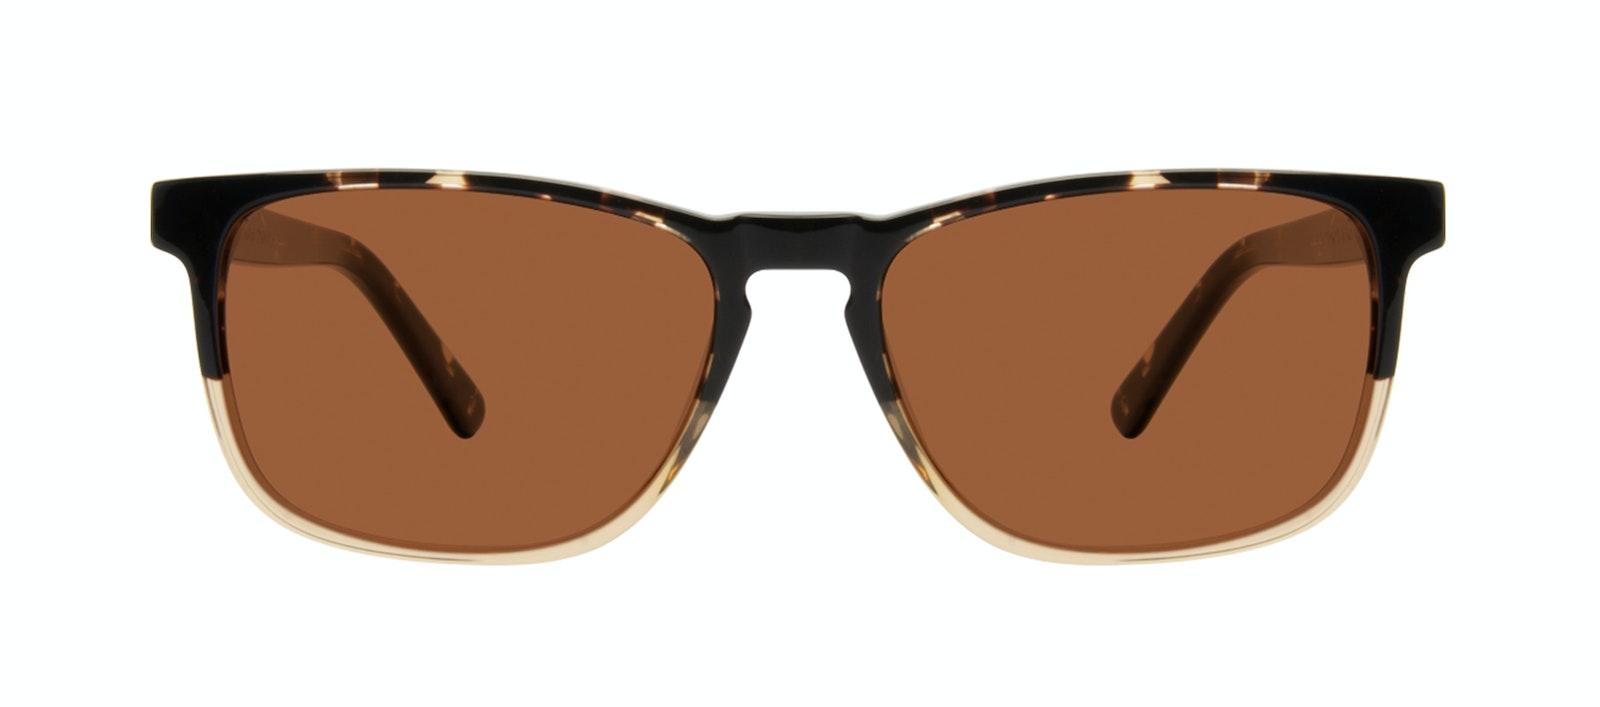 Affordable Fashion Glasses Rectangle Sunglasses Men Loft Golden Tortoise Front